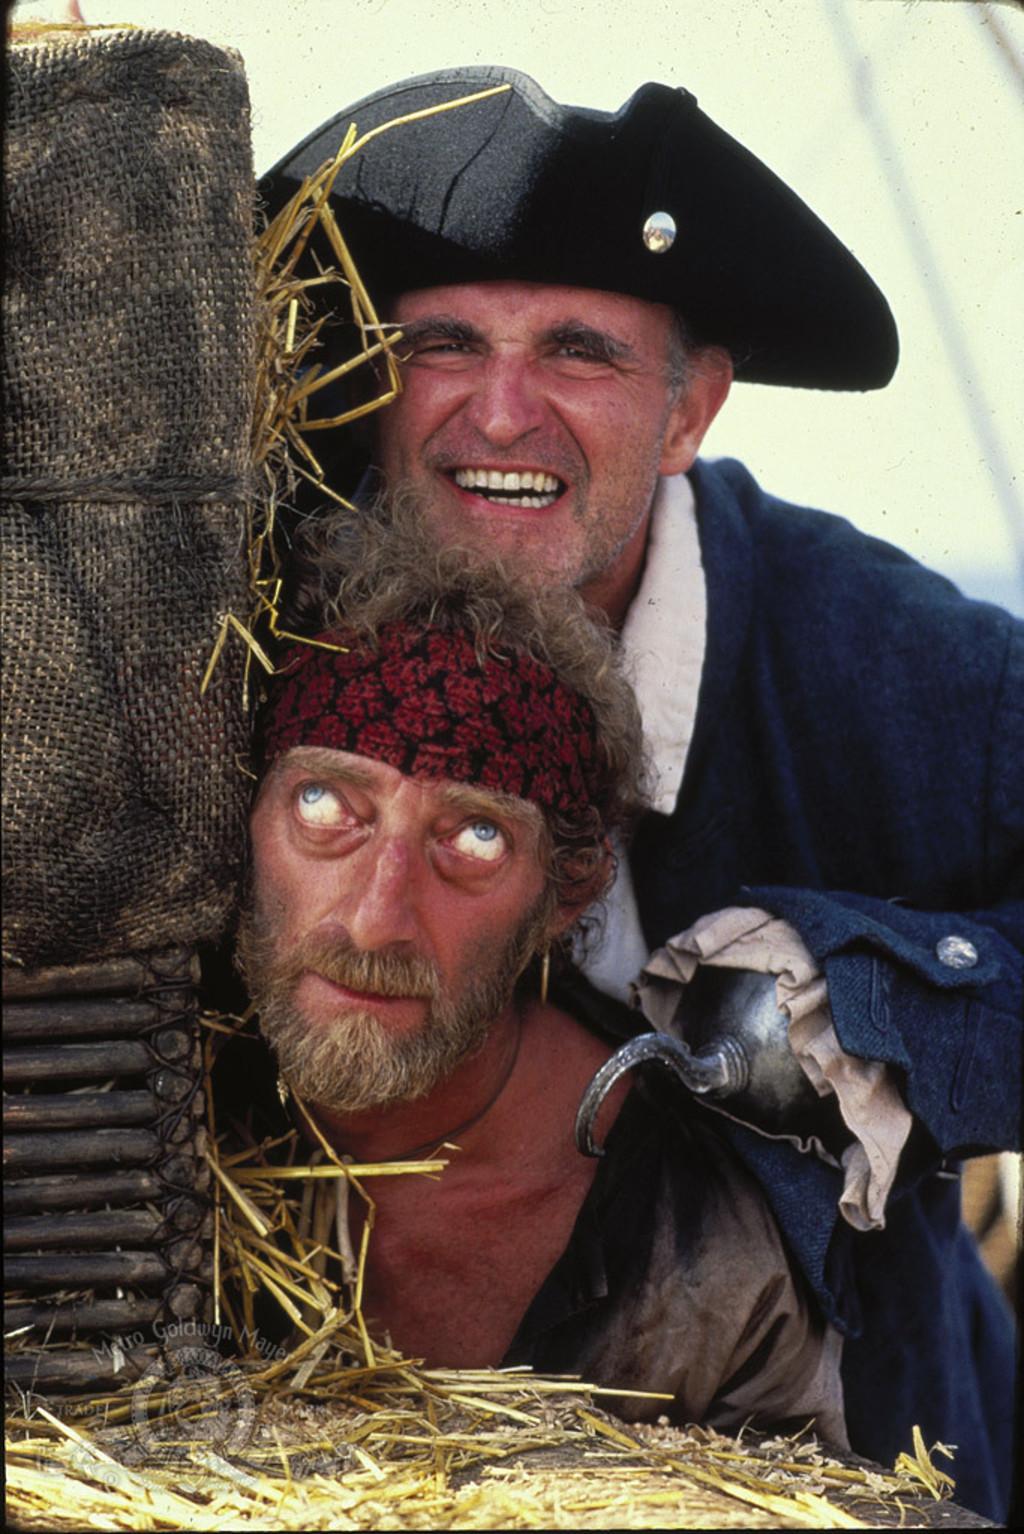 yellowbeard watch full movie